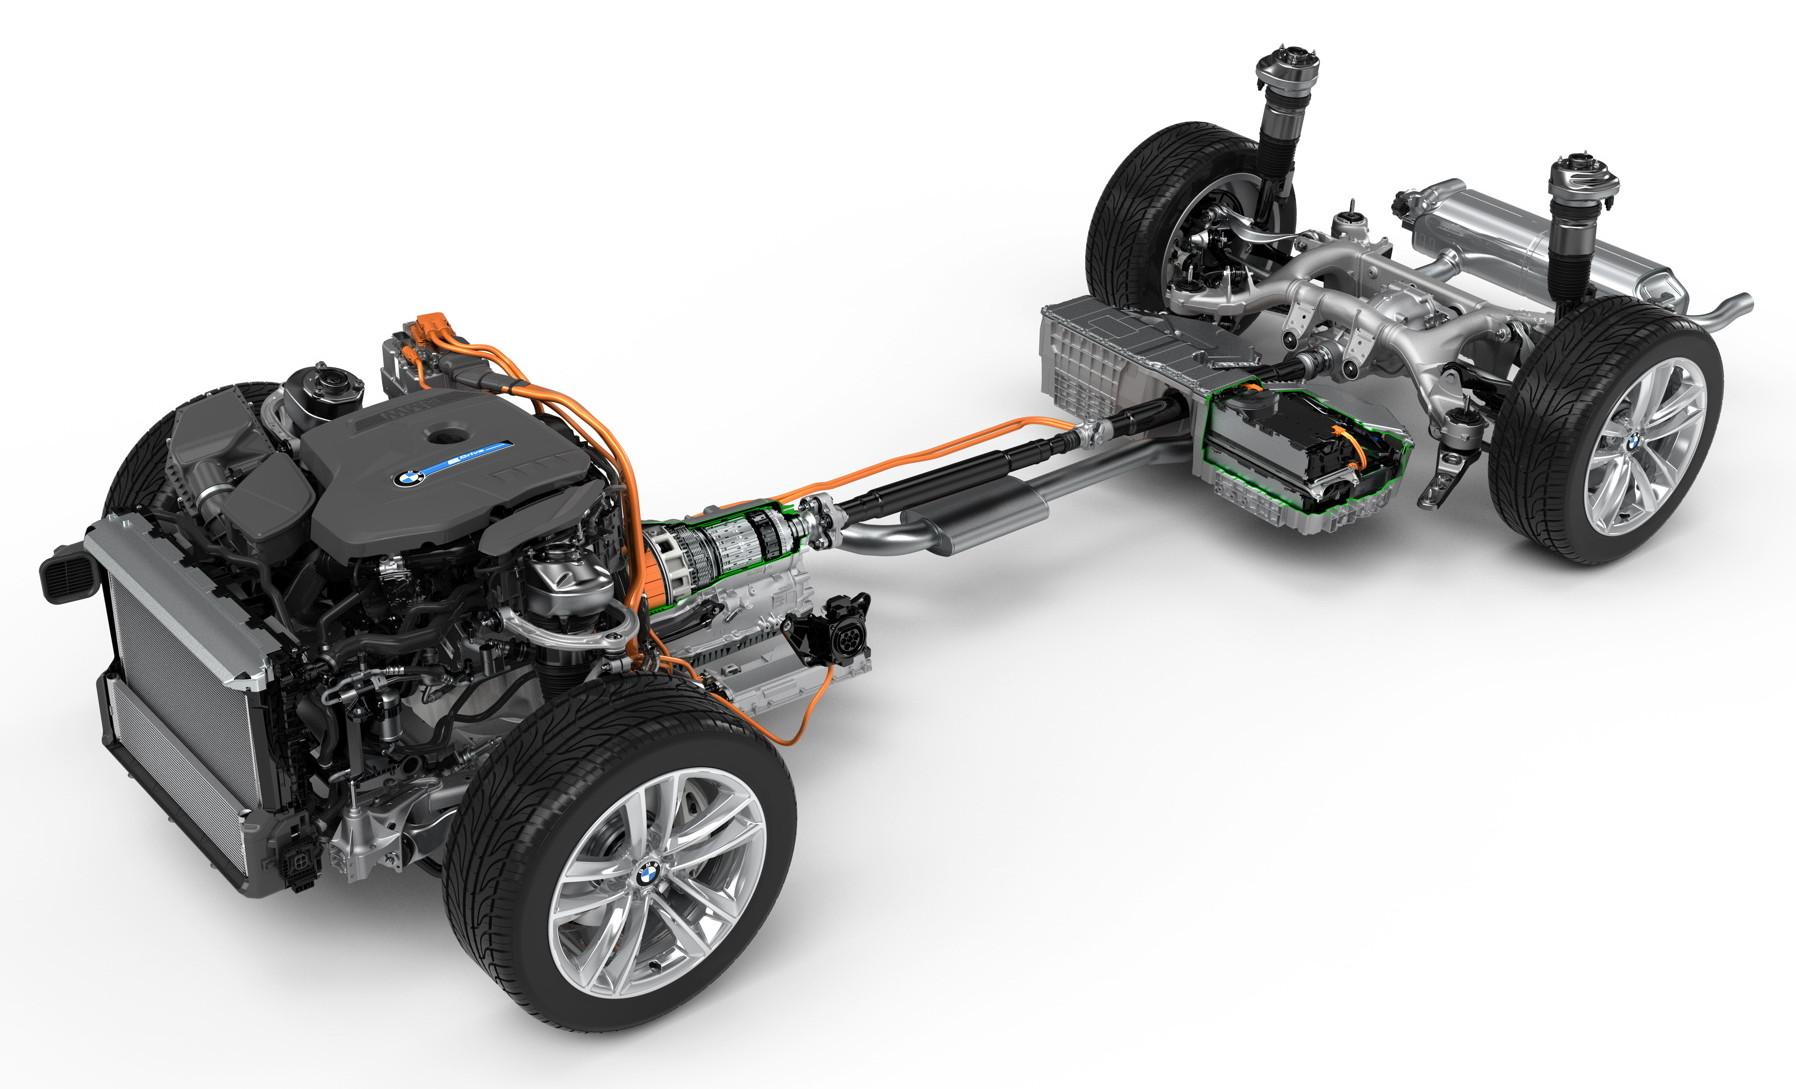 medium resolution of bmw i8 engine diagram wiring diagrams bmw i3 bmw i8 engine diagram